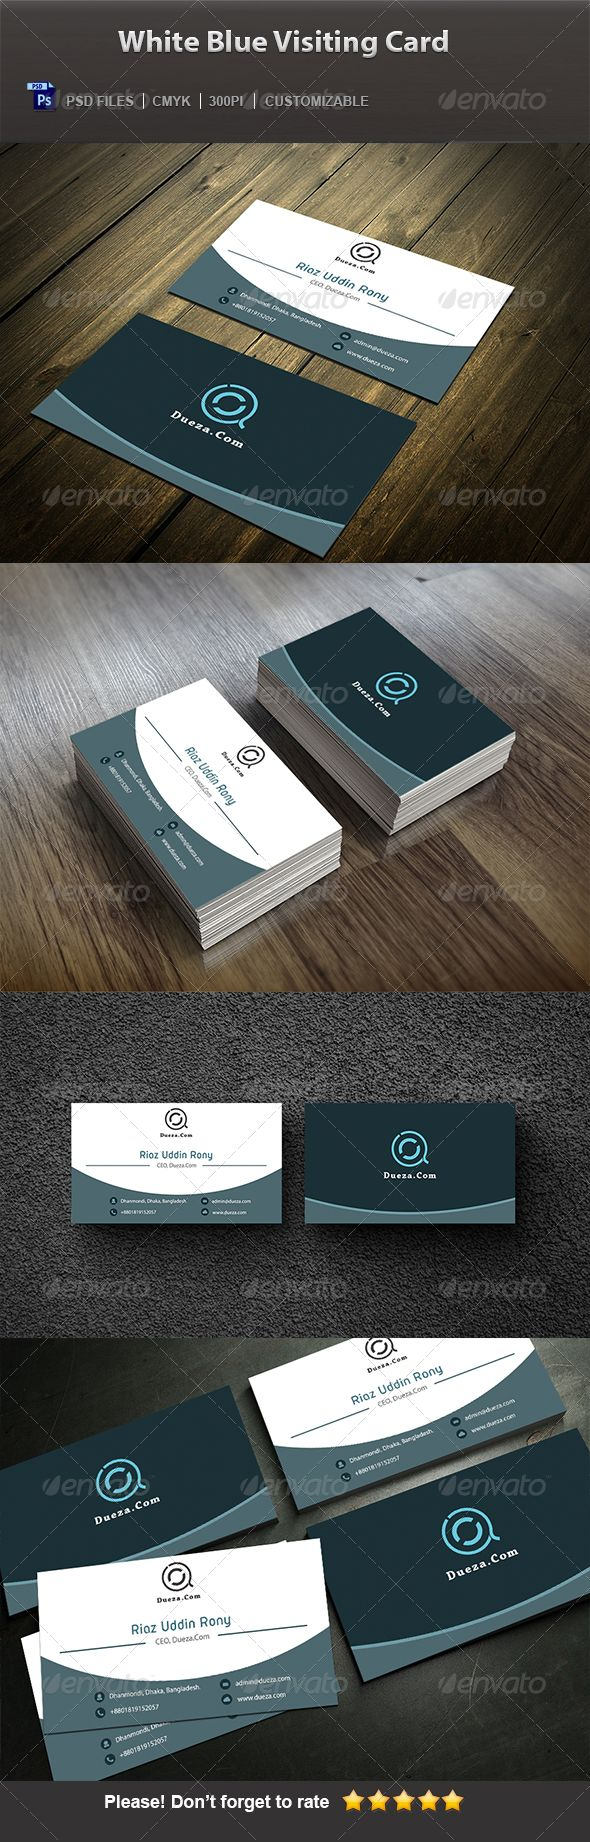 51 Best Blog For Modern Creative Business Card Design Images On